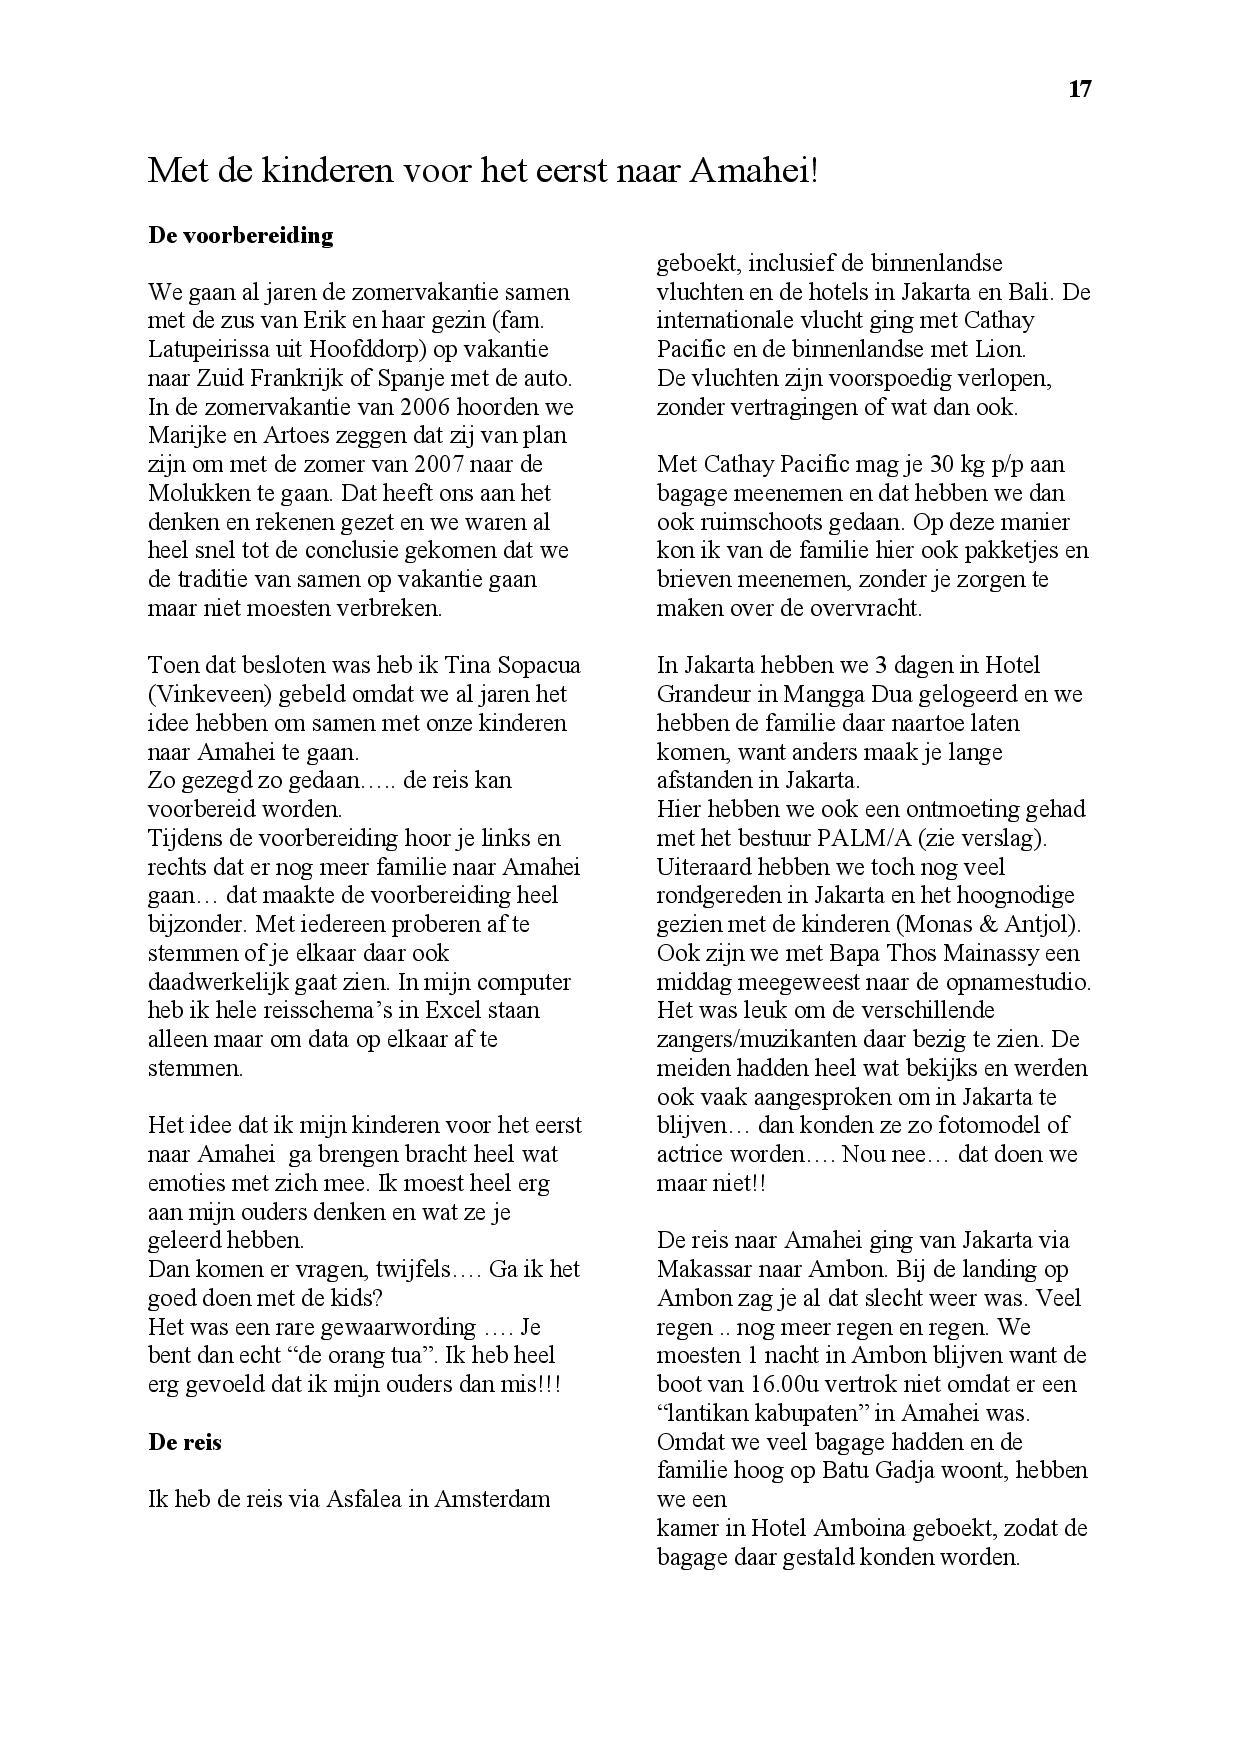 Saka Mese 3e jaargang nr. 02-2007 definitieve webversie-page-017